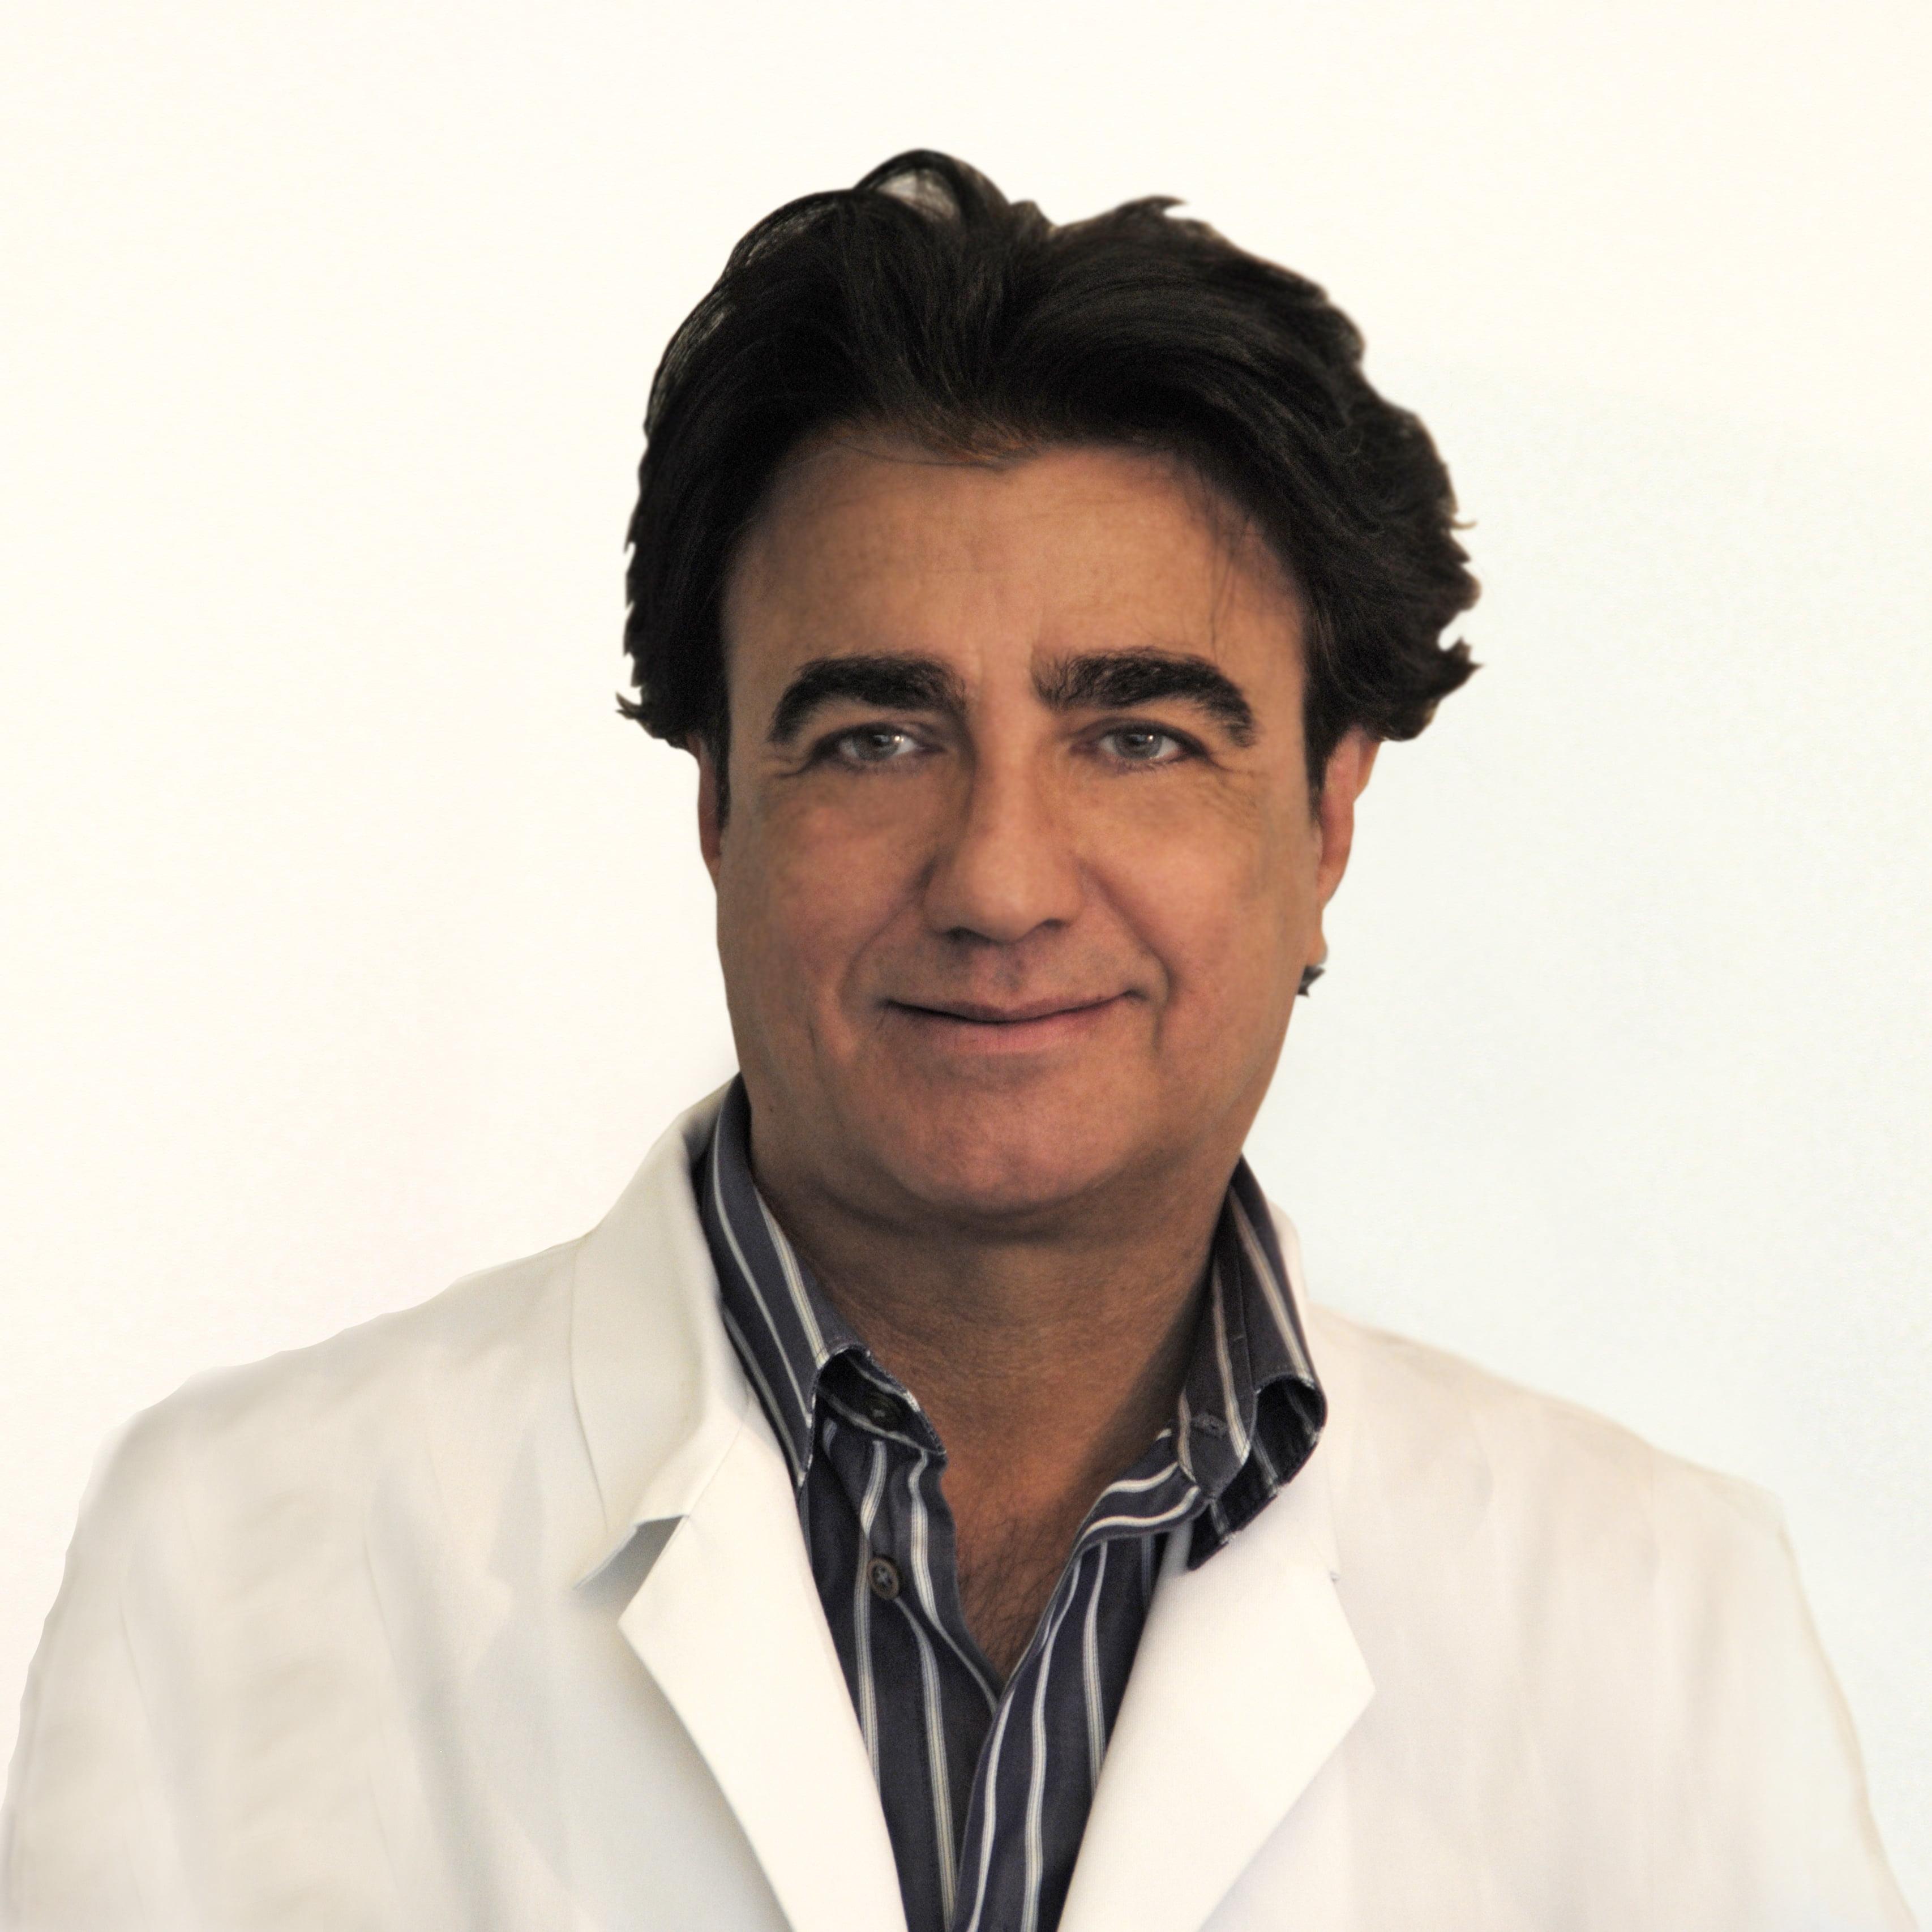 Dr. Antonio Callizo